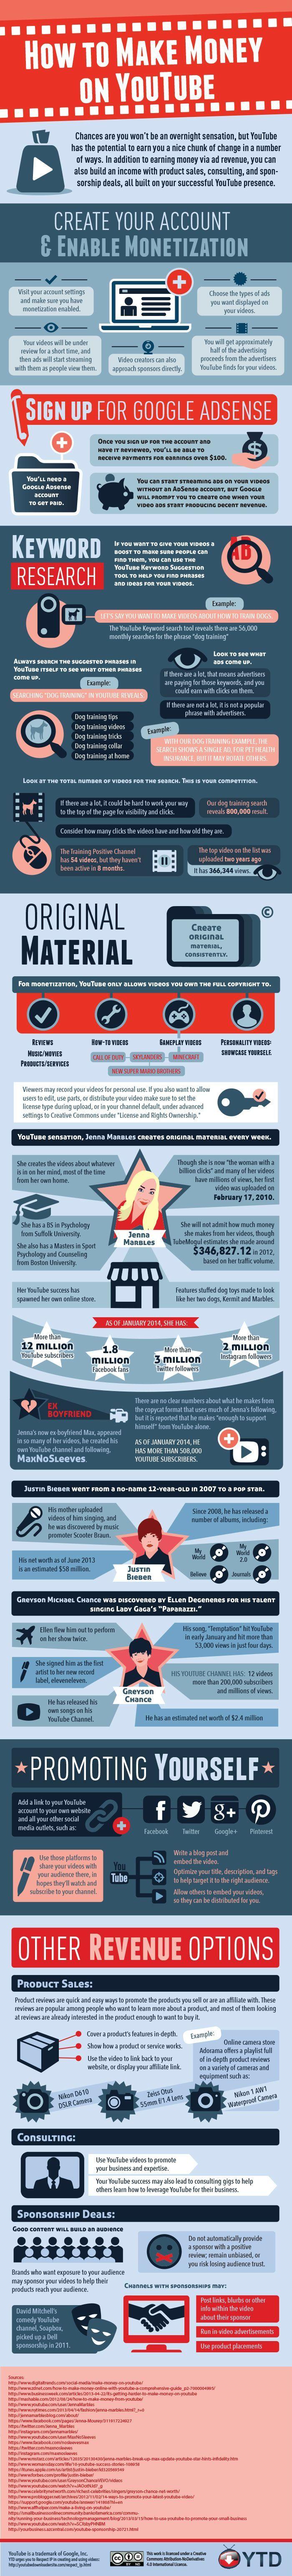 How to Earn Money on #YouTube - #infographic #socialmedia